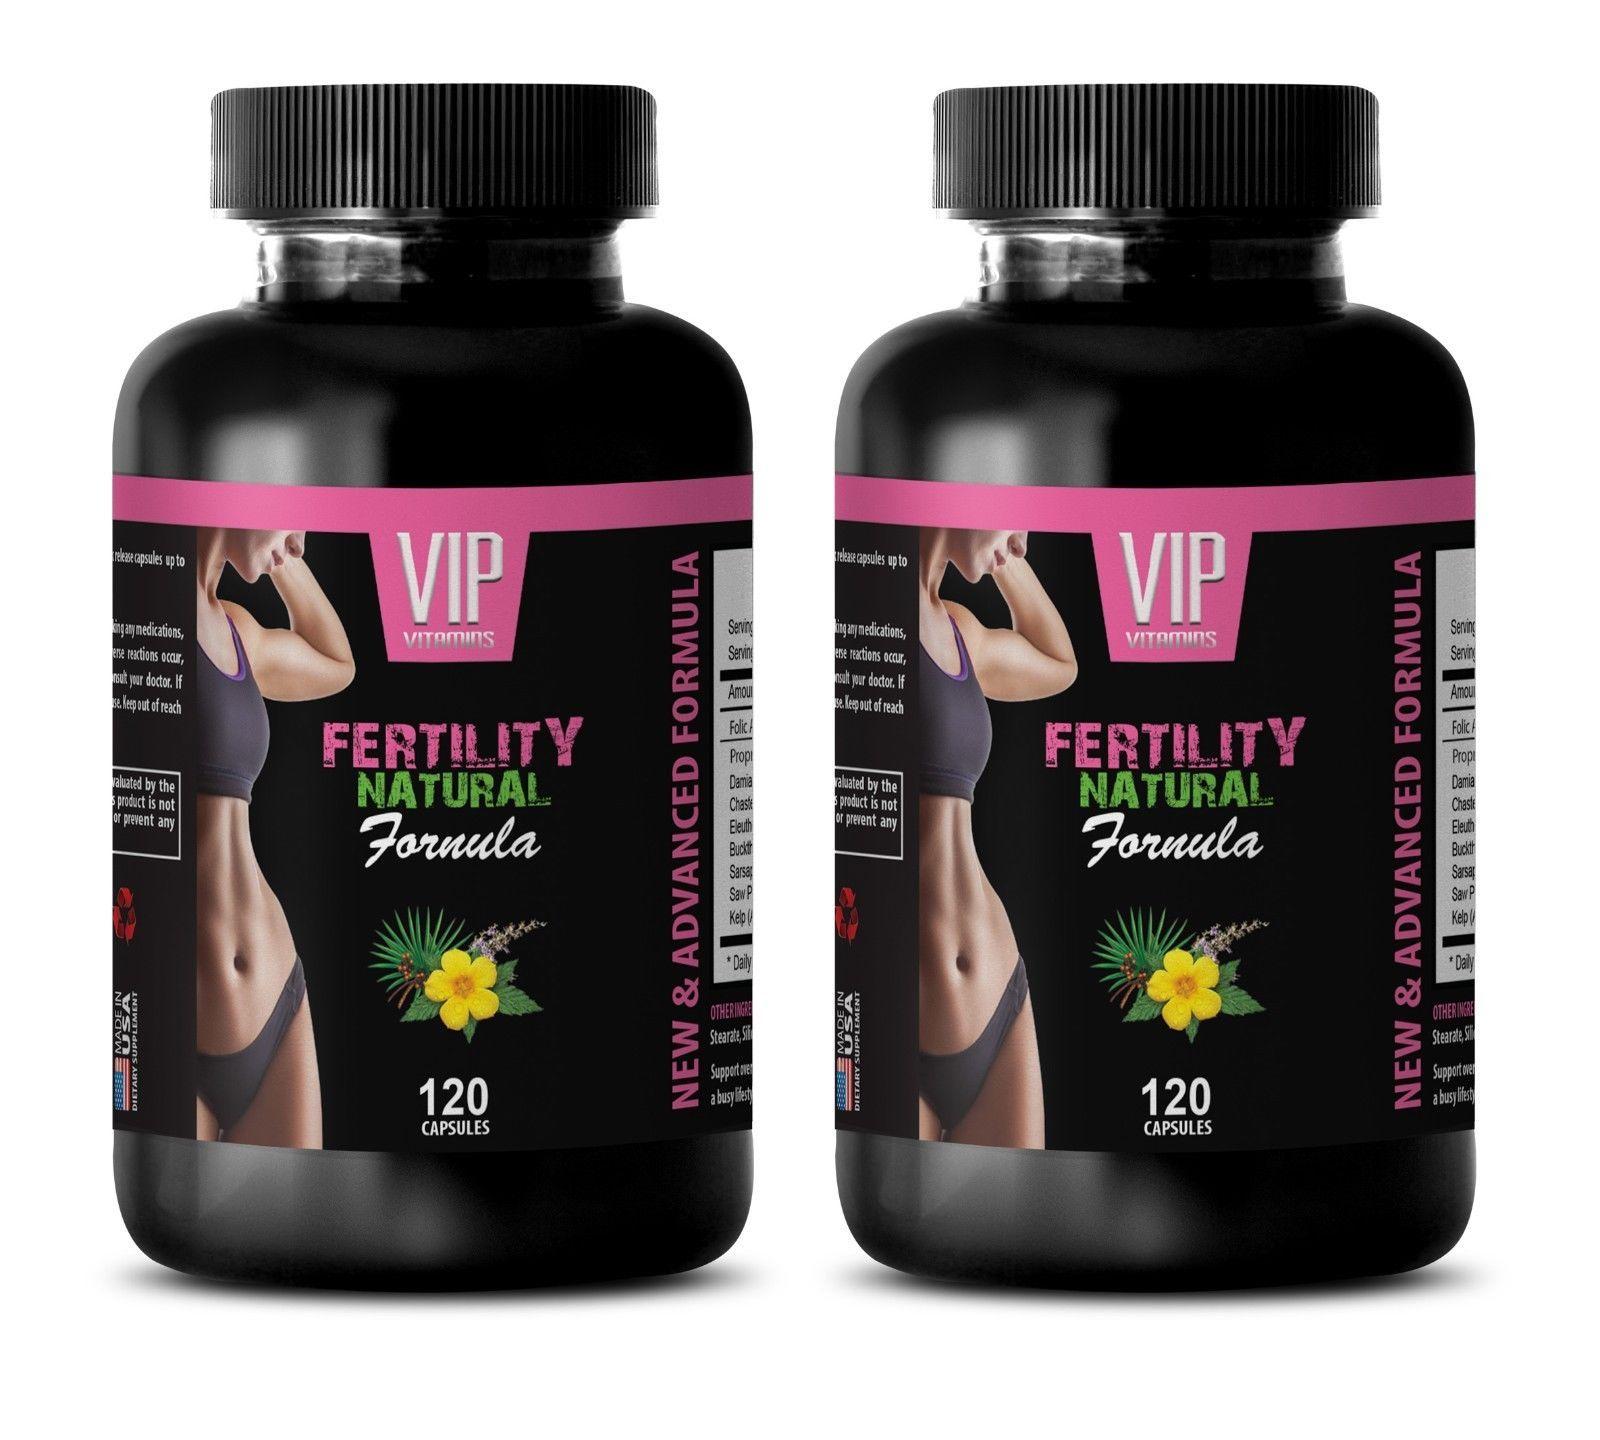 female libido pills -2B FERTILITY NATURAL 240 CAPSULES